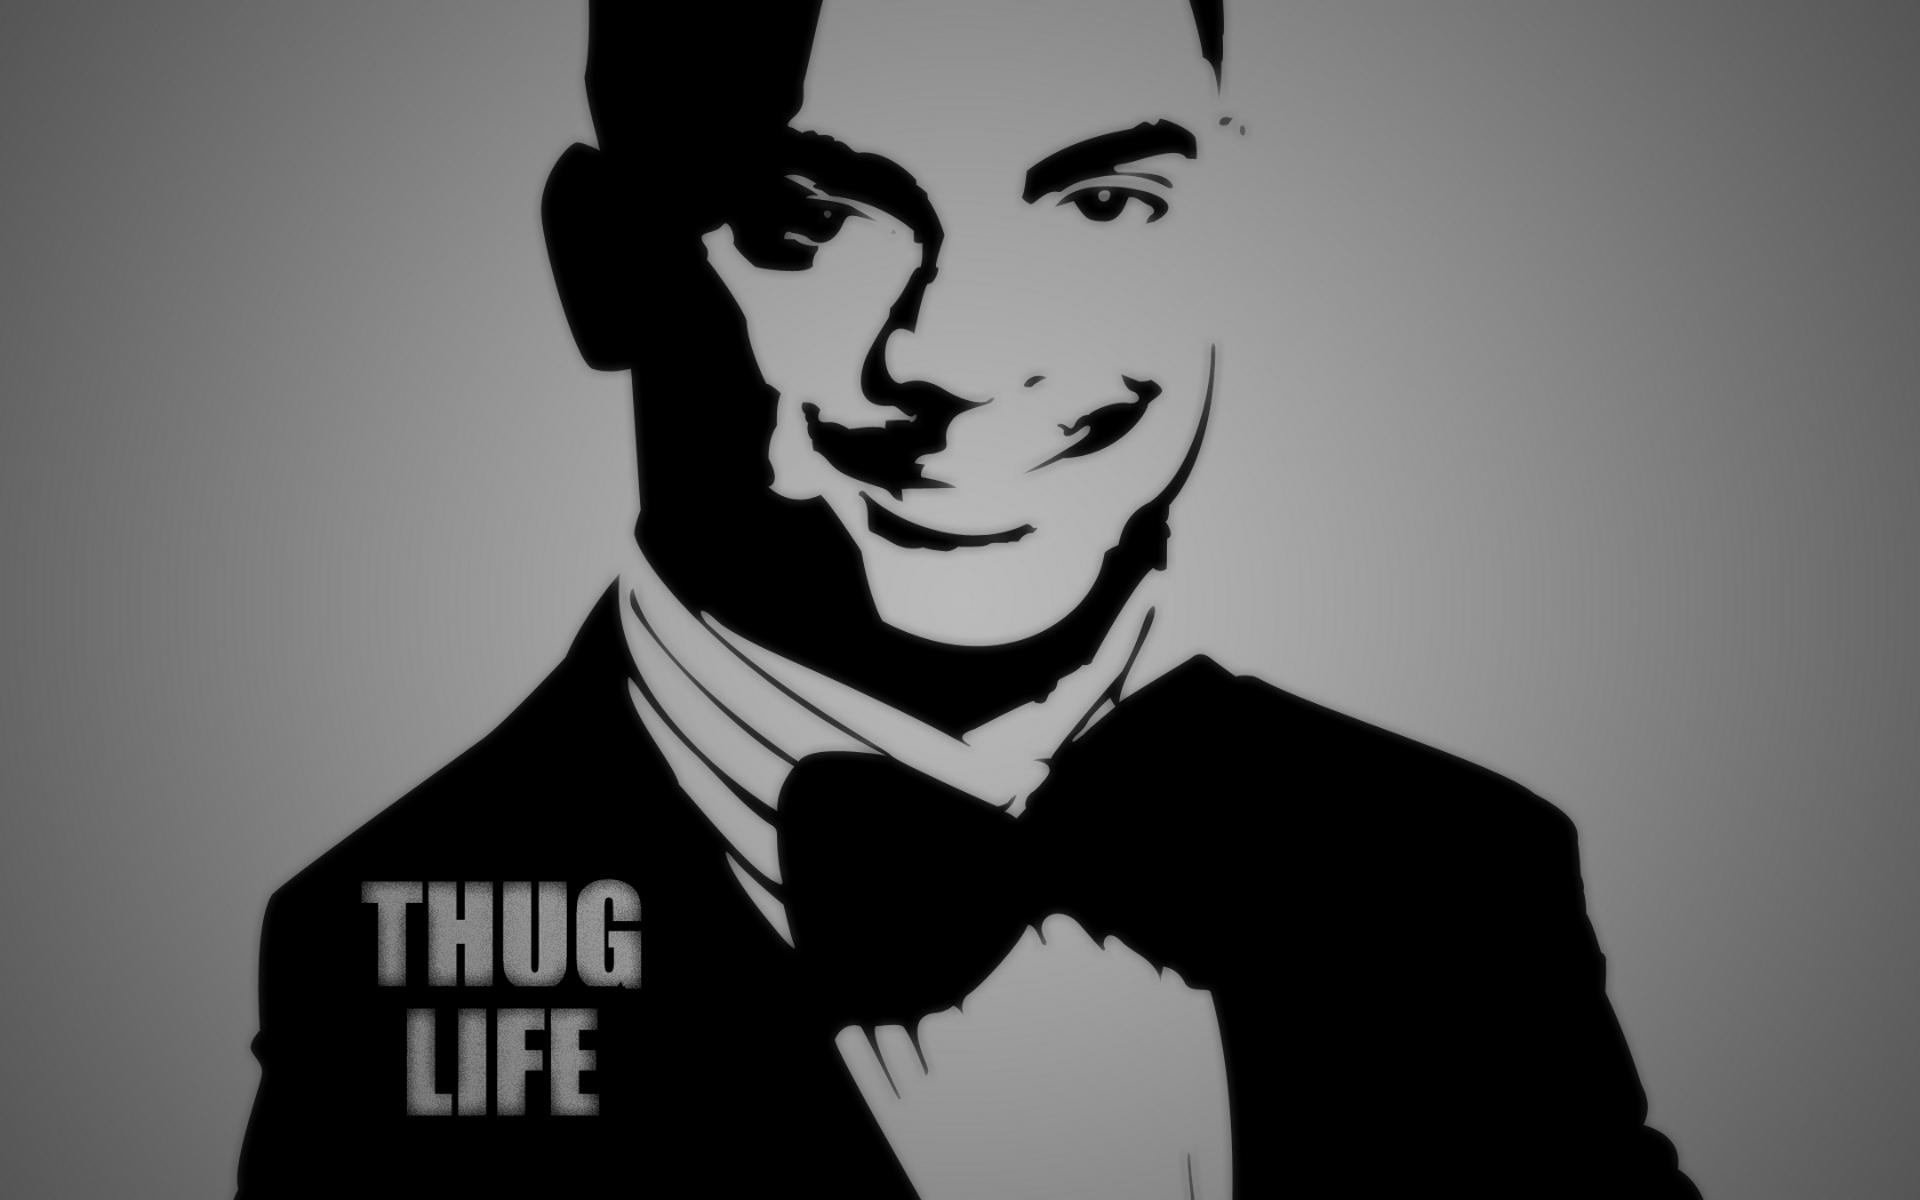 Thug Life Wallpaper   Hilarious Wallpaper 1920x1200